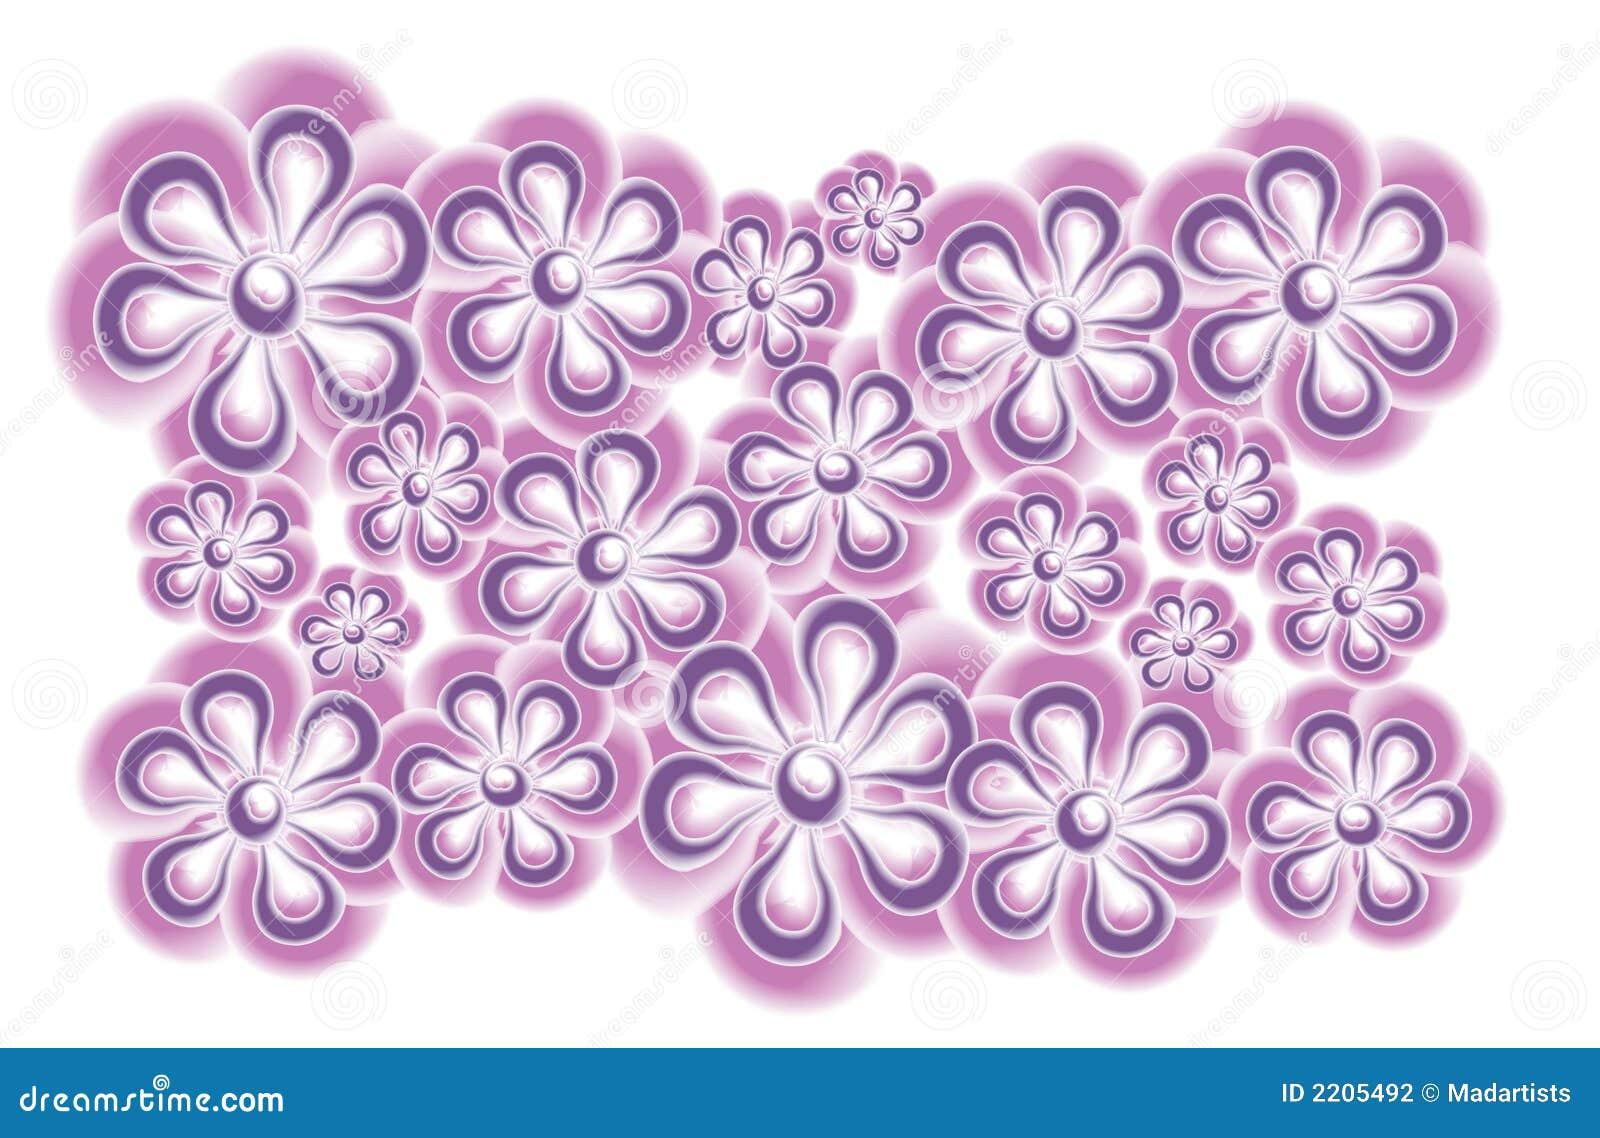 Pink Purple Flower Clip Art Stock Vector Illustration Of Elements